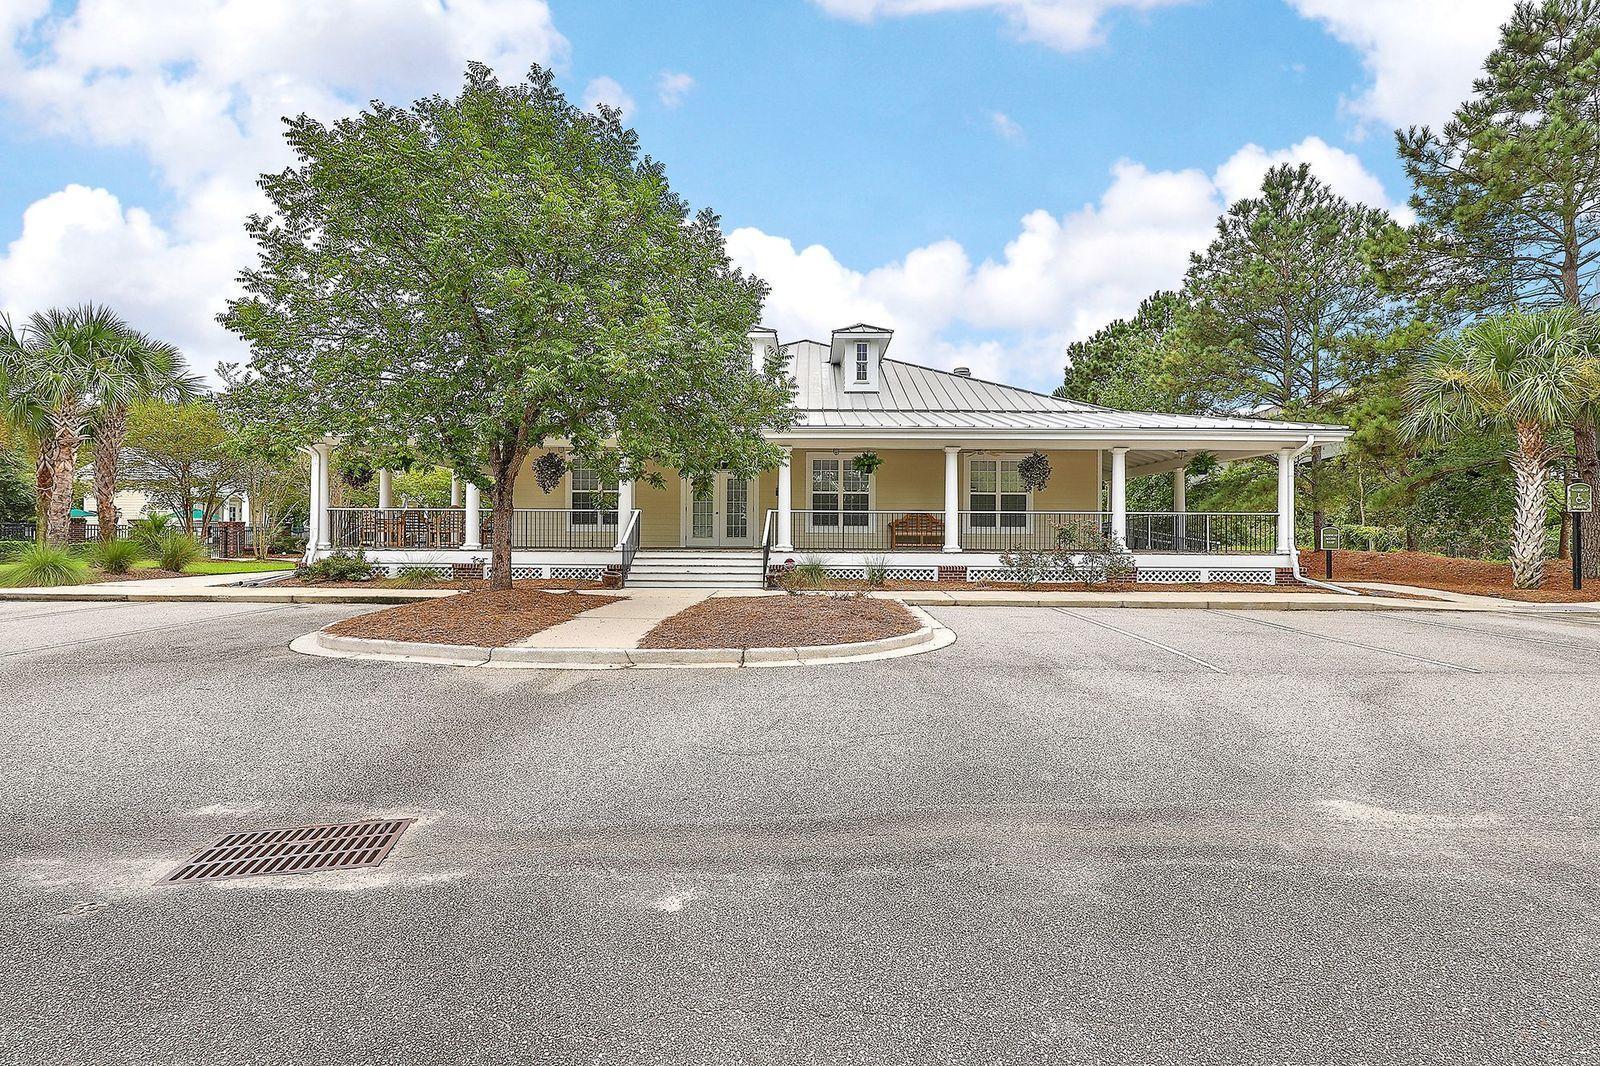 Etiwan Pointe Homes For Sale - 208 Etiwan Pointe, Mount Pleasant, SC - 11